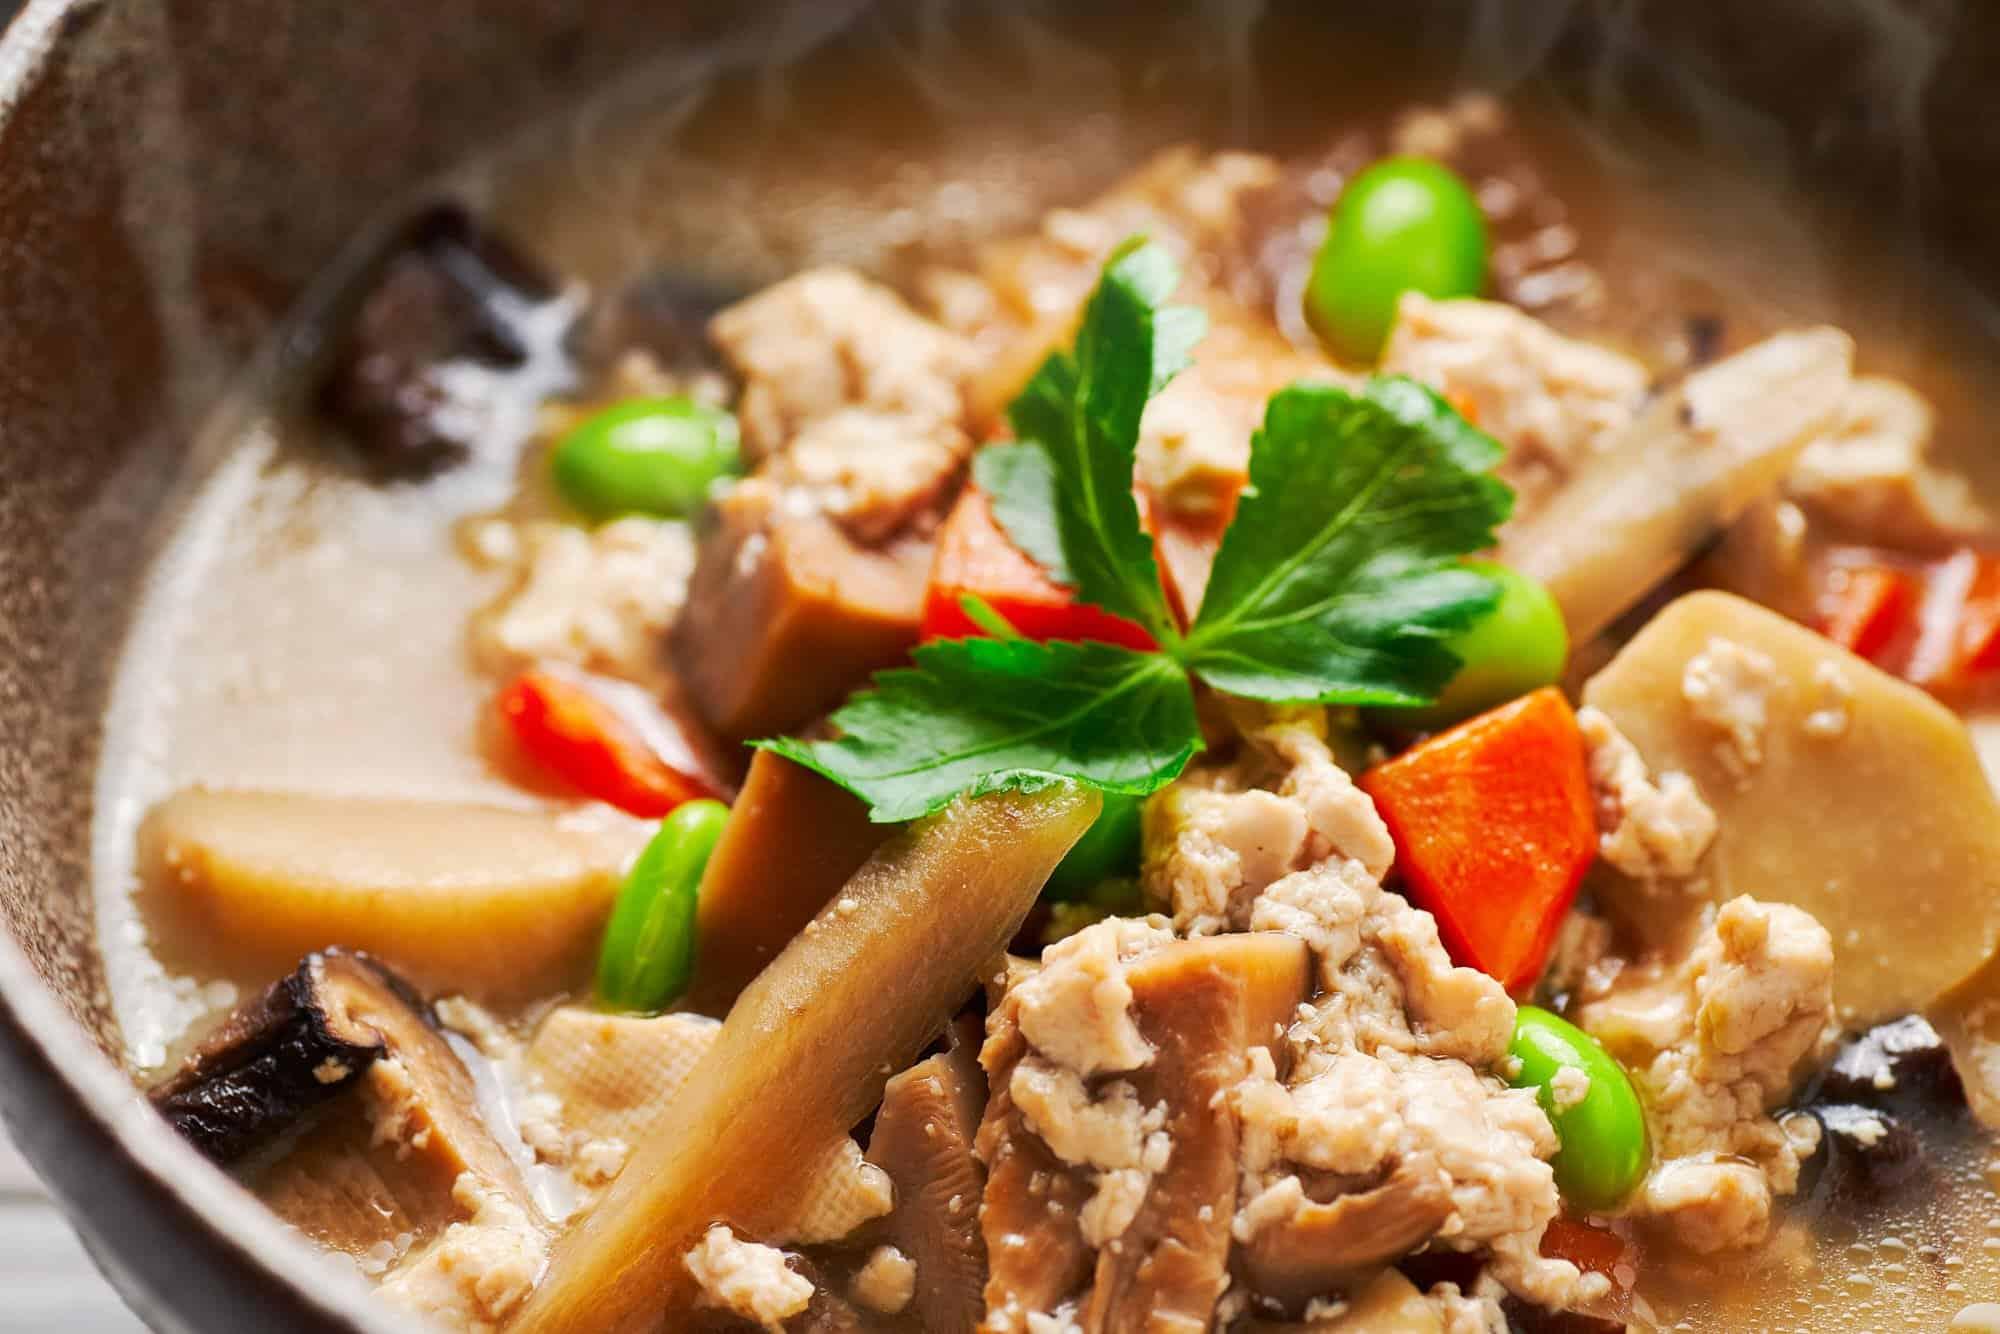 Based in Buddhist monk cuisine, Kenchinjiru is a vegan Japanese soup that's loaded with veggies and tofu in a savory shiitake mushroom stock.